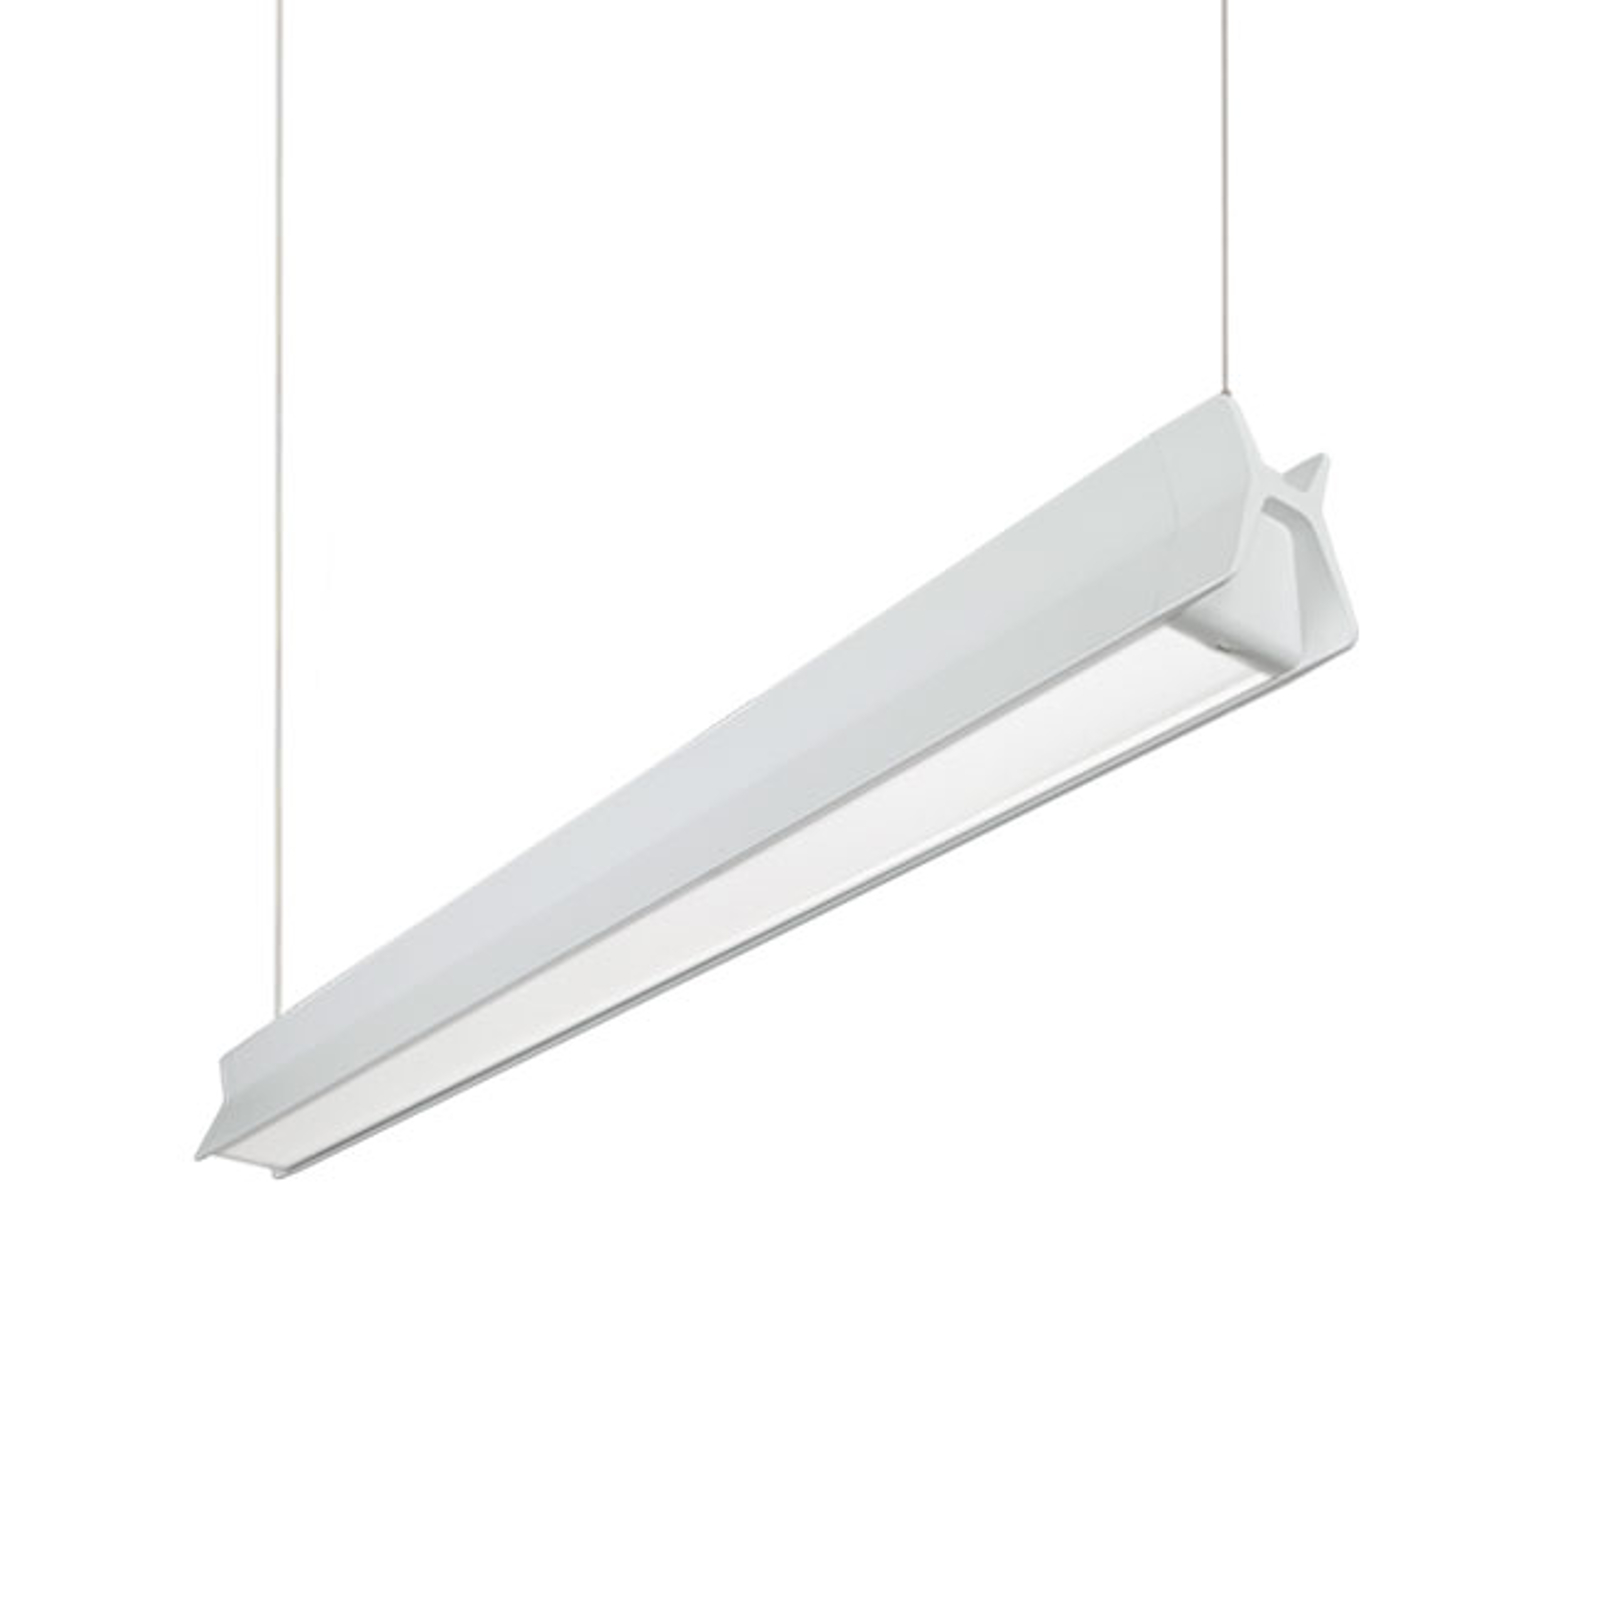 LED hanglamp C56-P1200, 50/50, wit, 156,3 cm